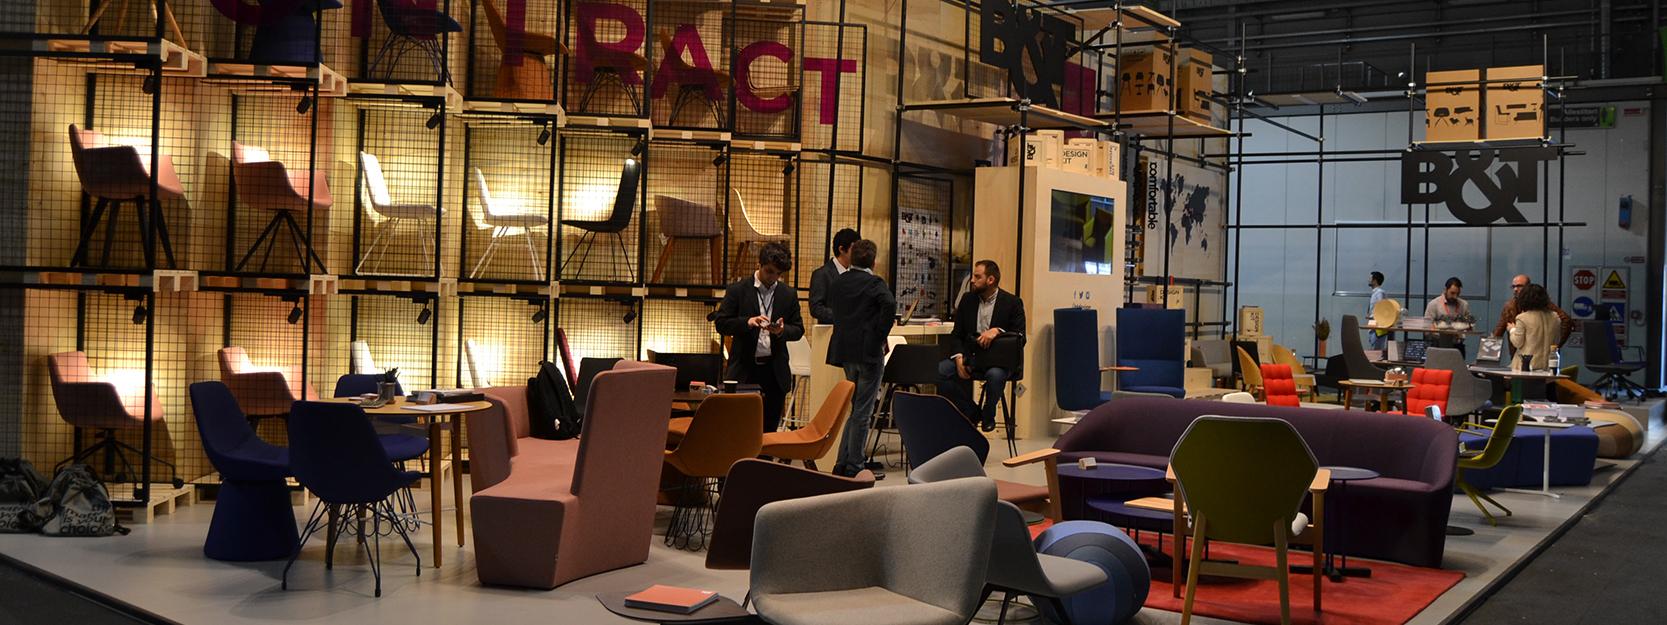 Salon de Milan